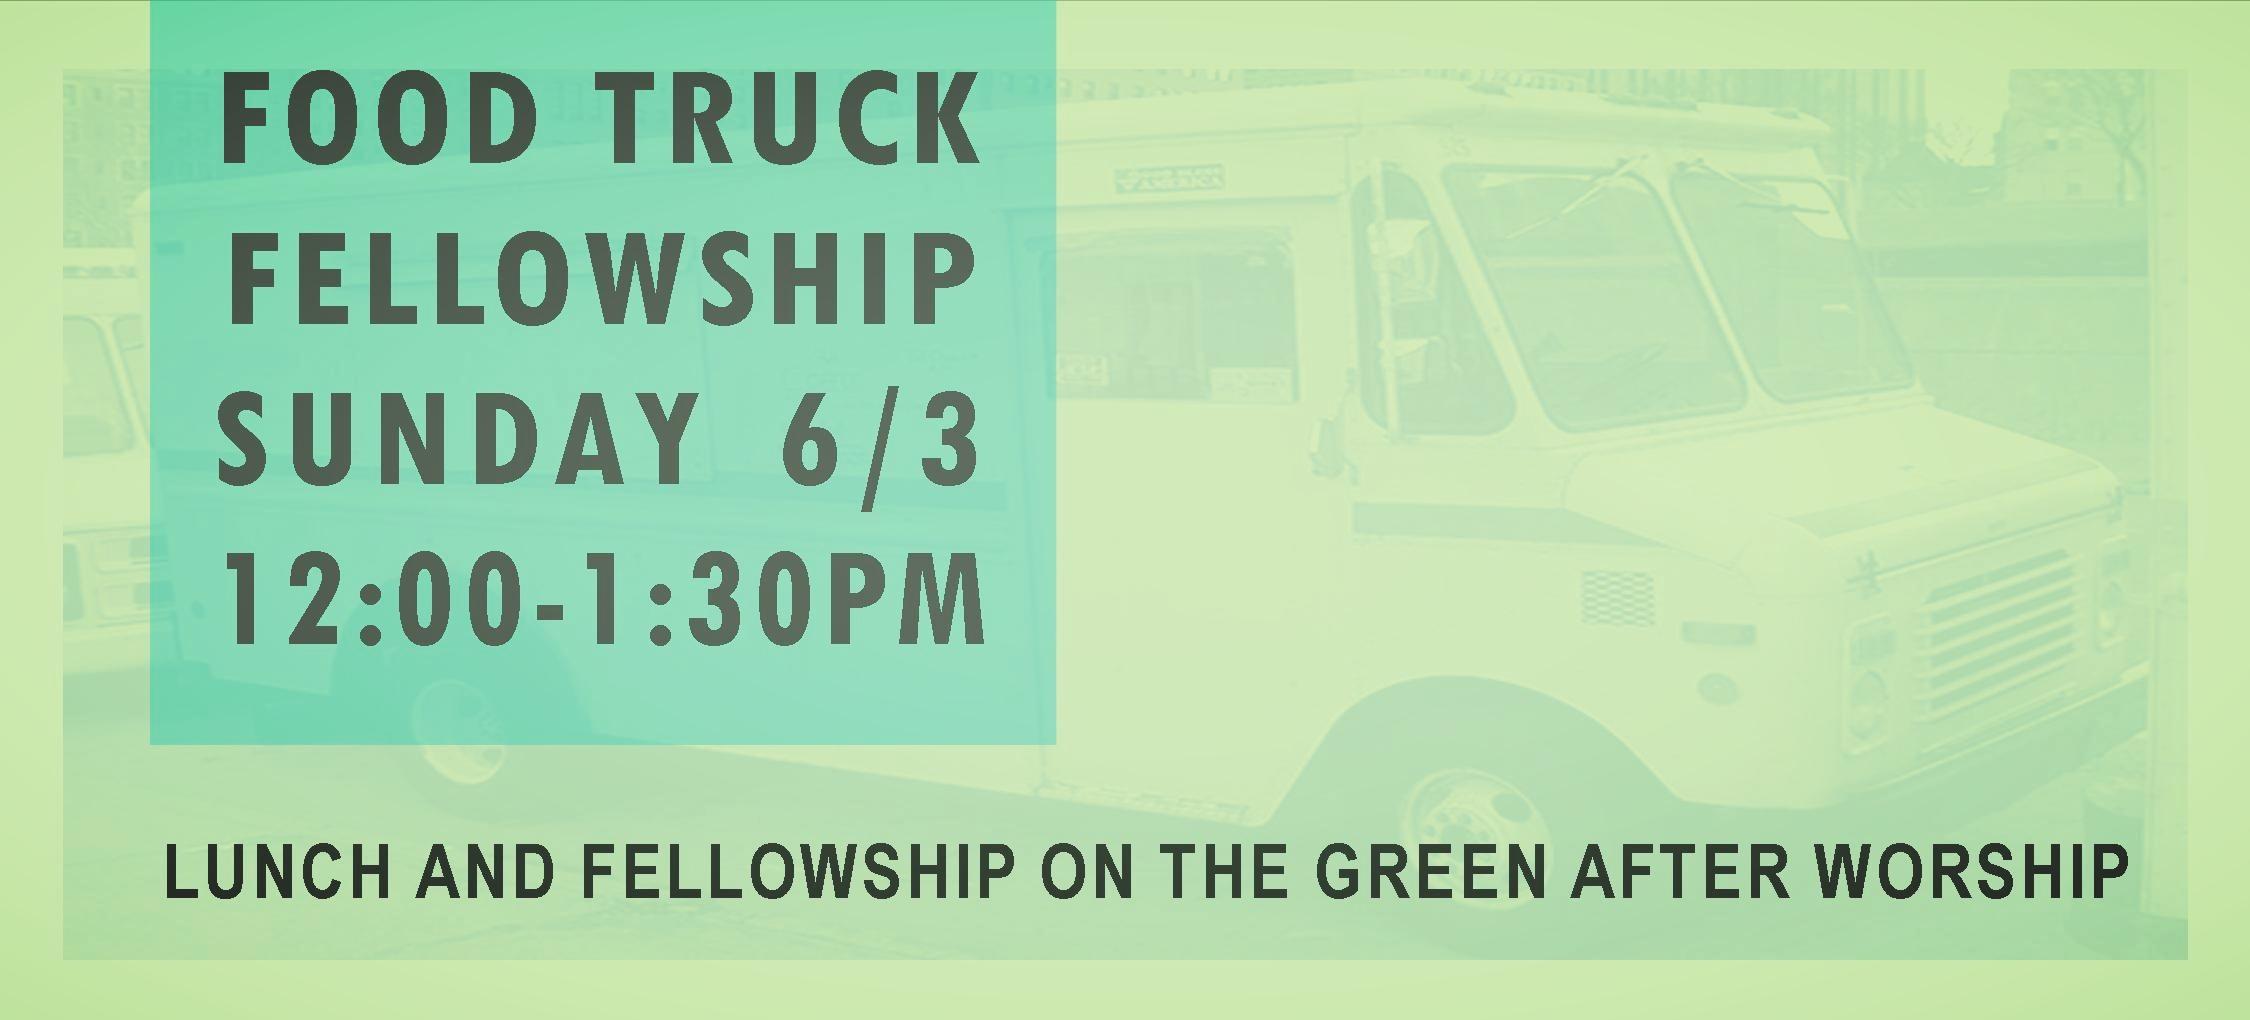 Food Truck Fellowship Web Page Slider 052118.jpg